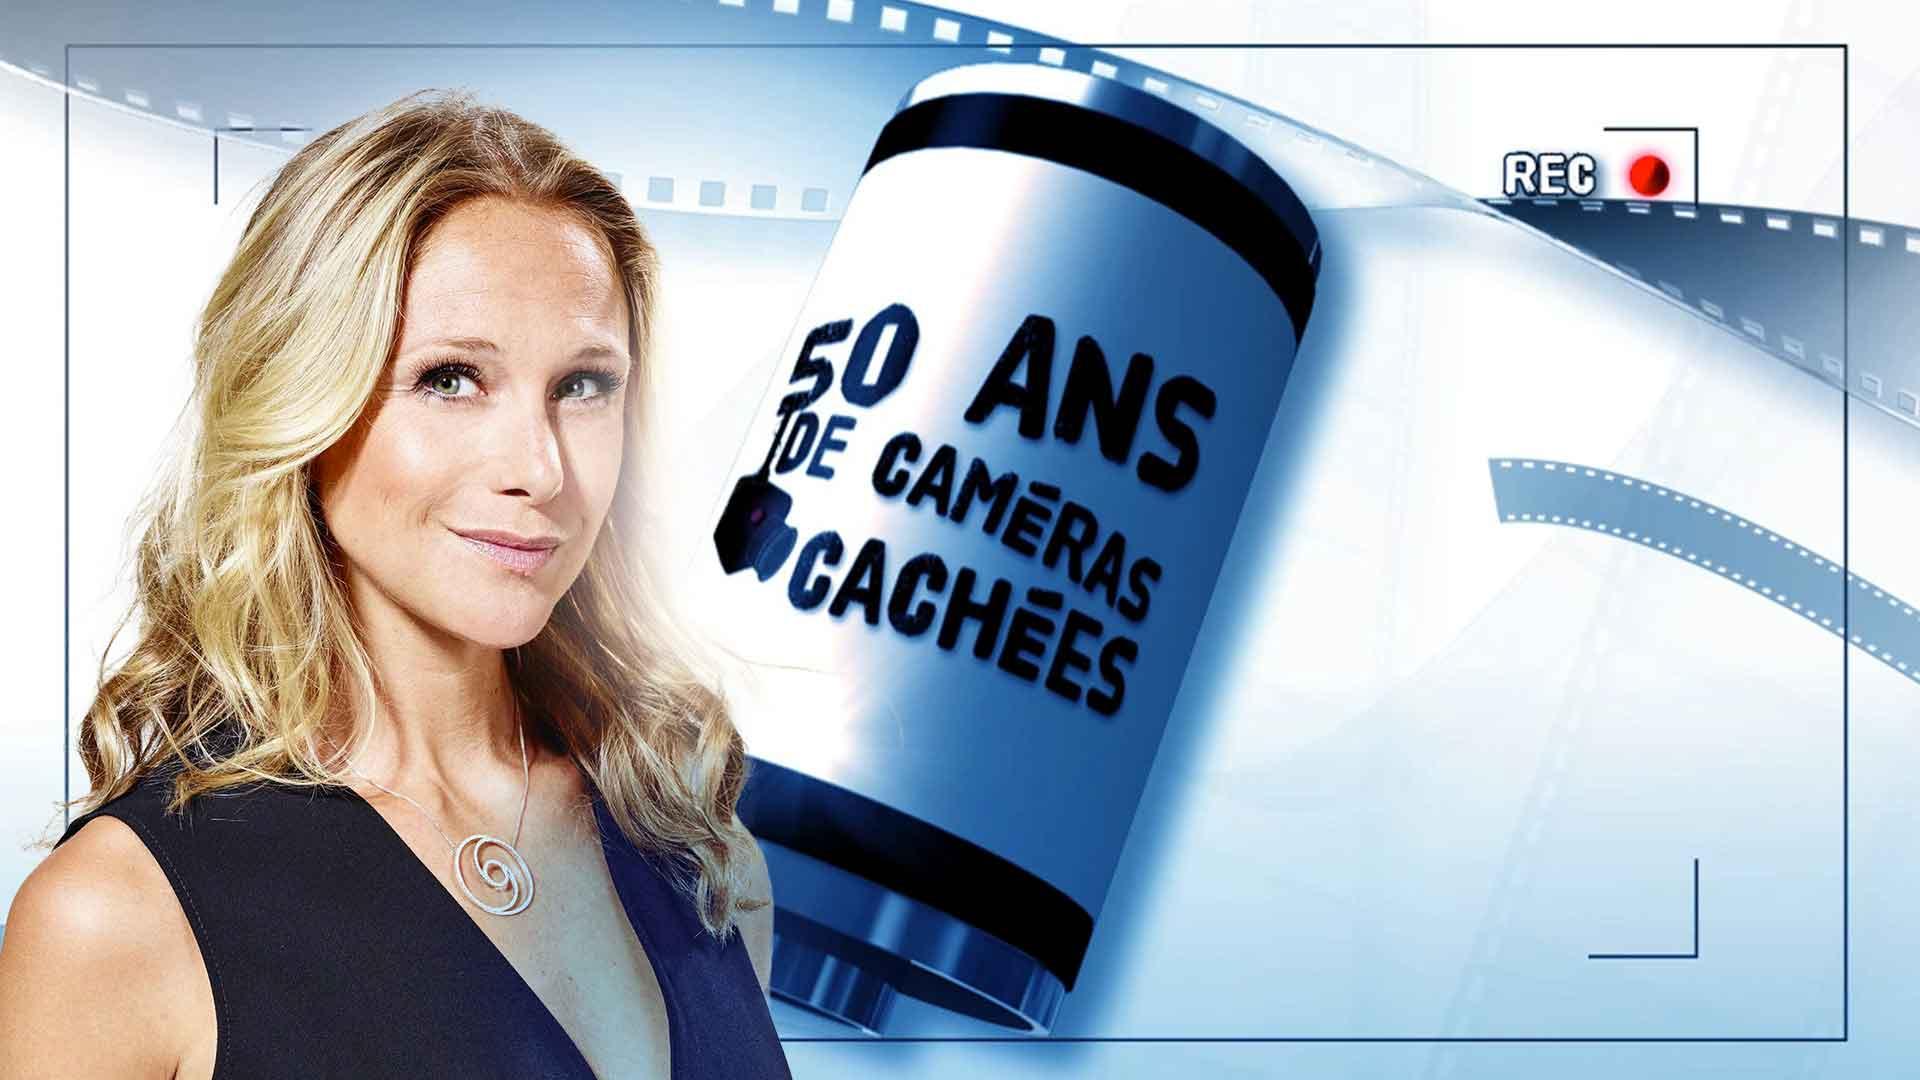 50 ANS DE CAMERA CACHEE